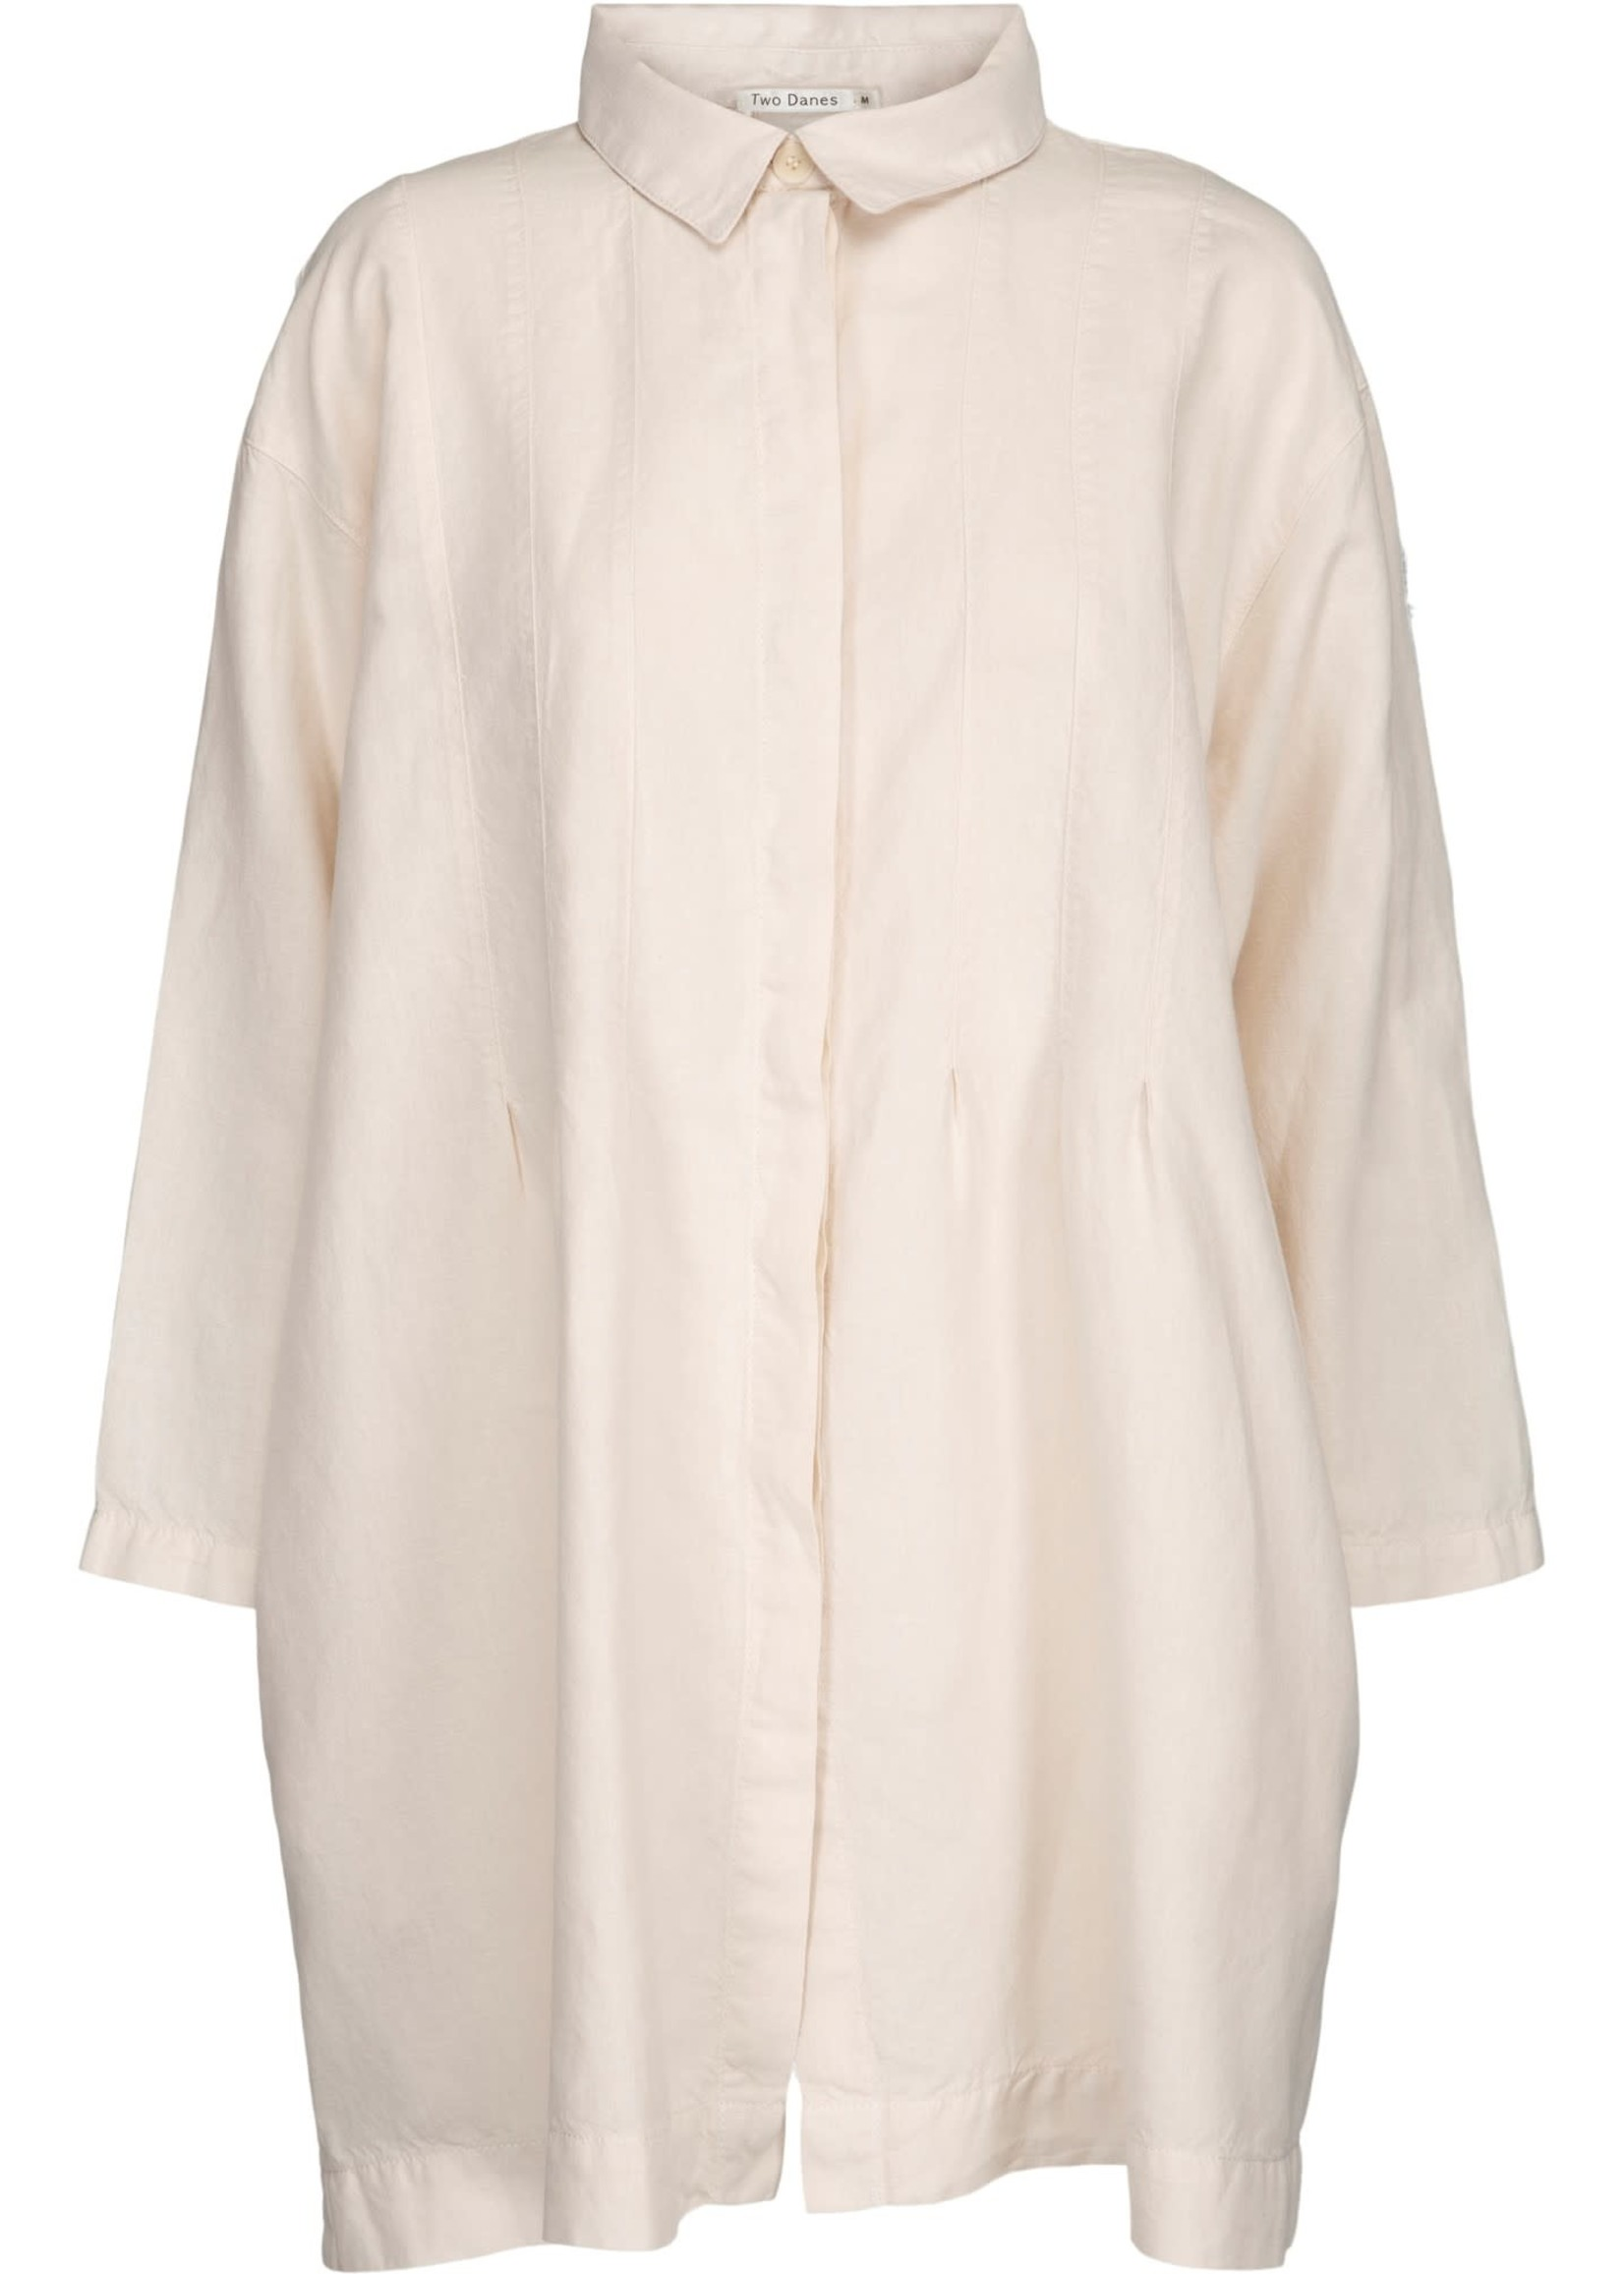 TWO DANES 37514 391 Lis Linen Cotton Shirt